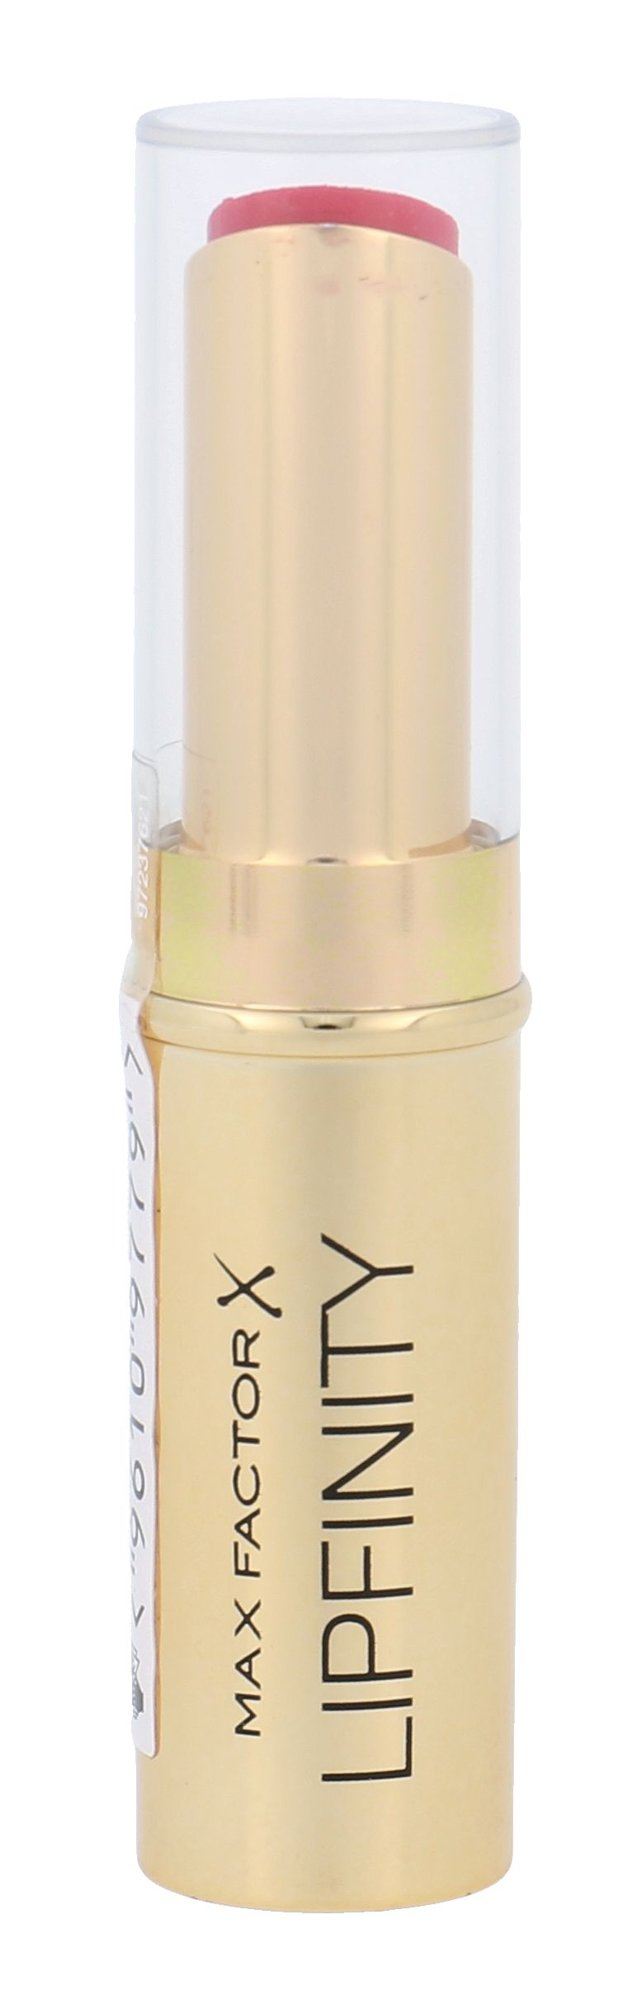 Max Factor Lipfinity Cosmetic 3,4ml 45 So Vivid